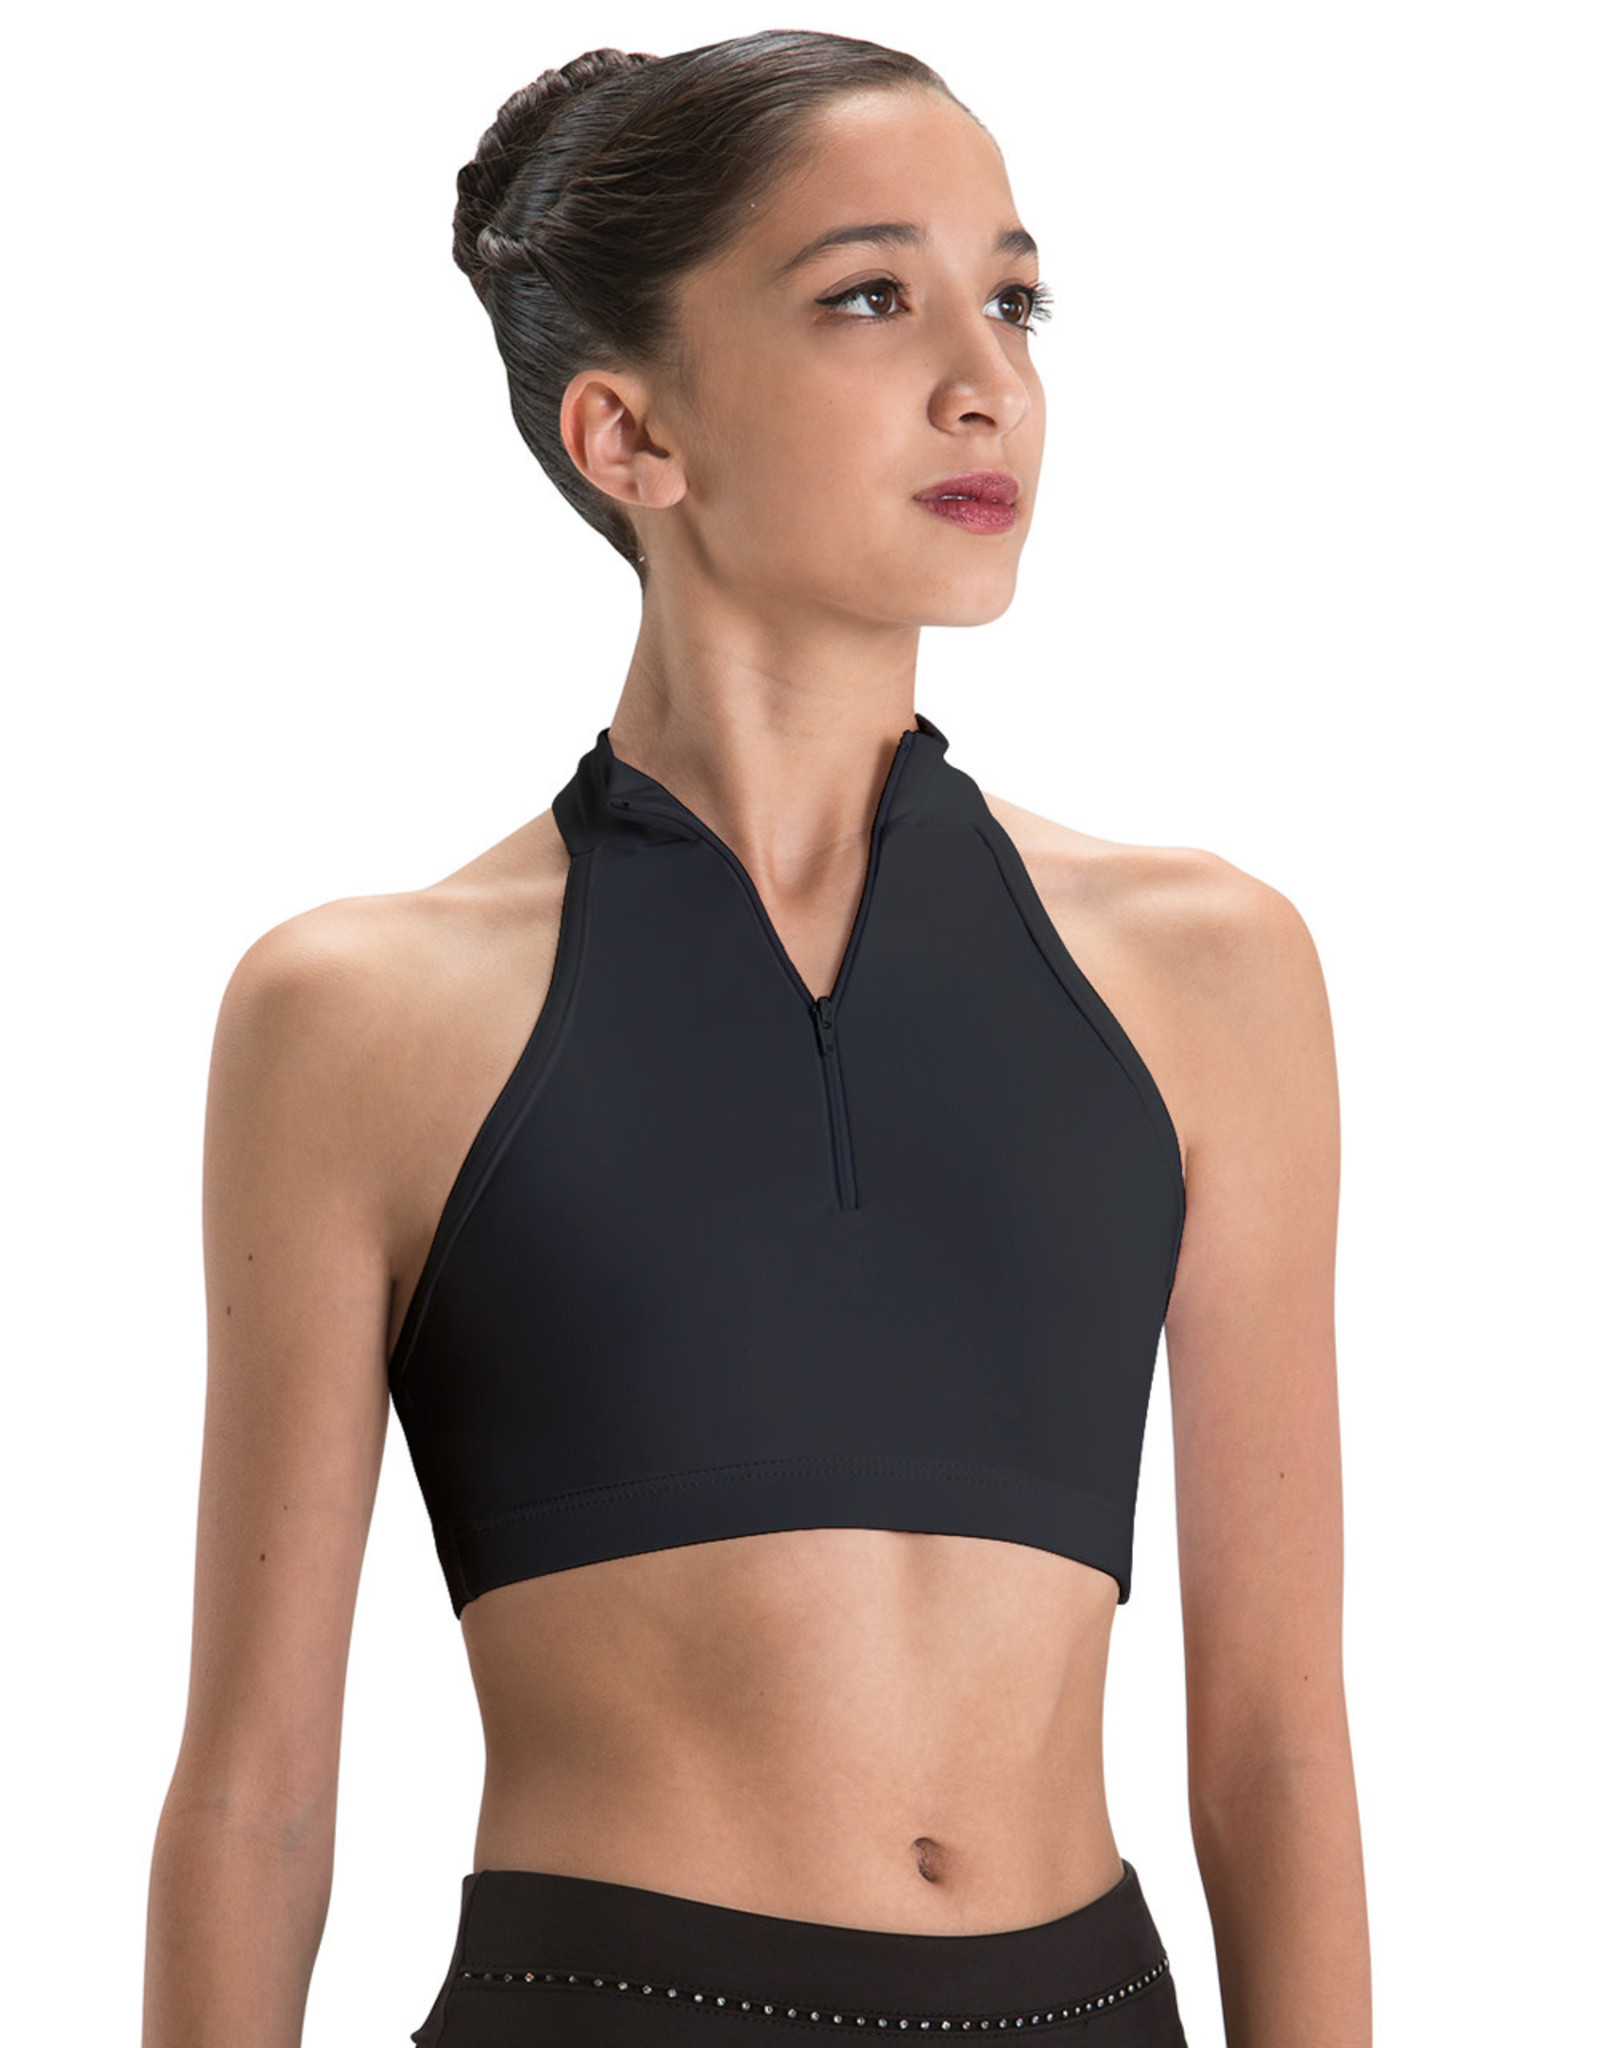 Motionwear Motionwear Adult  Zip Front Halter Bra Top 3045